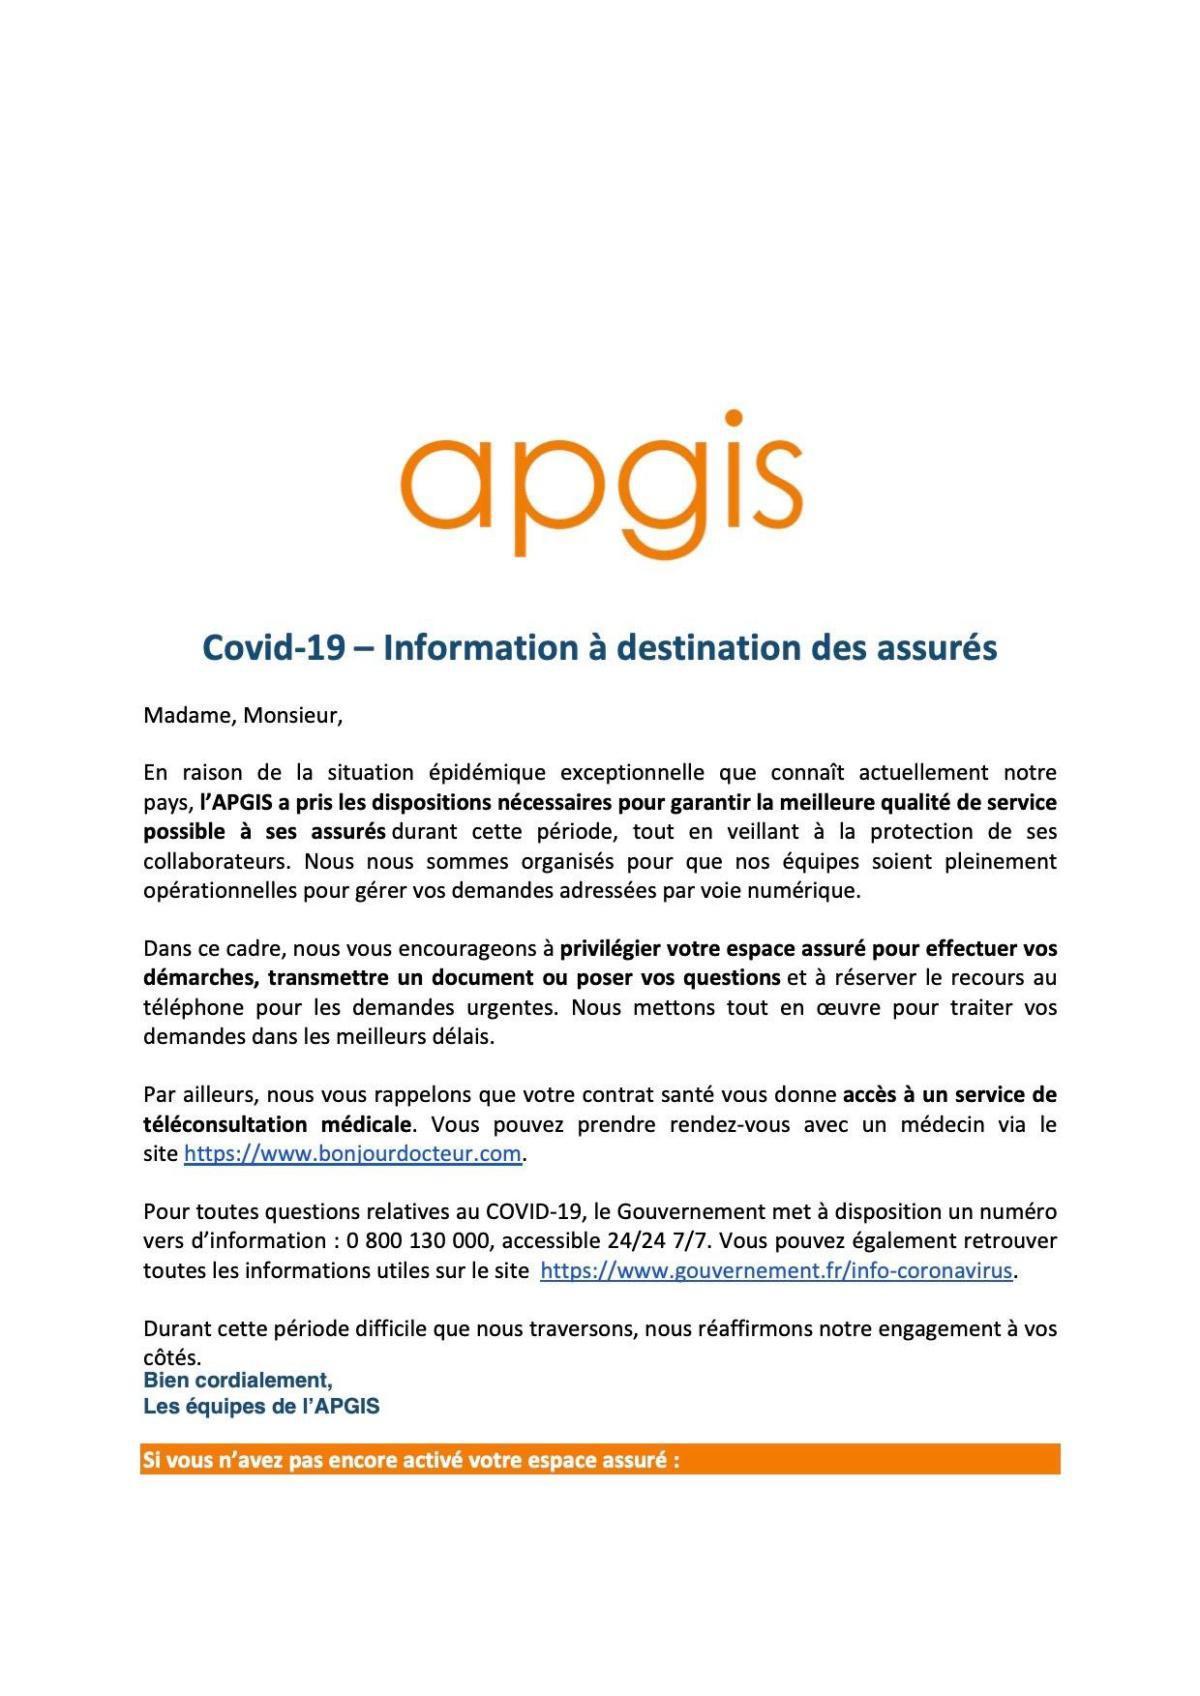 Coronavirus : Communication de l'APGIS